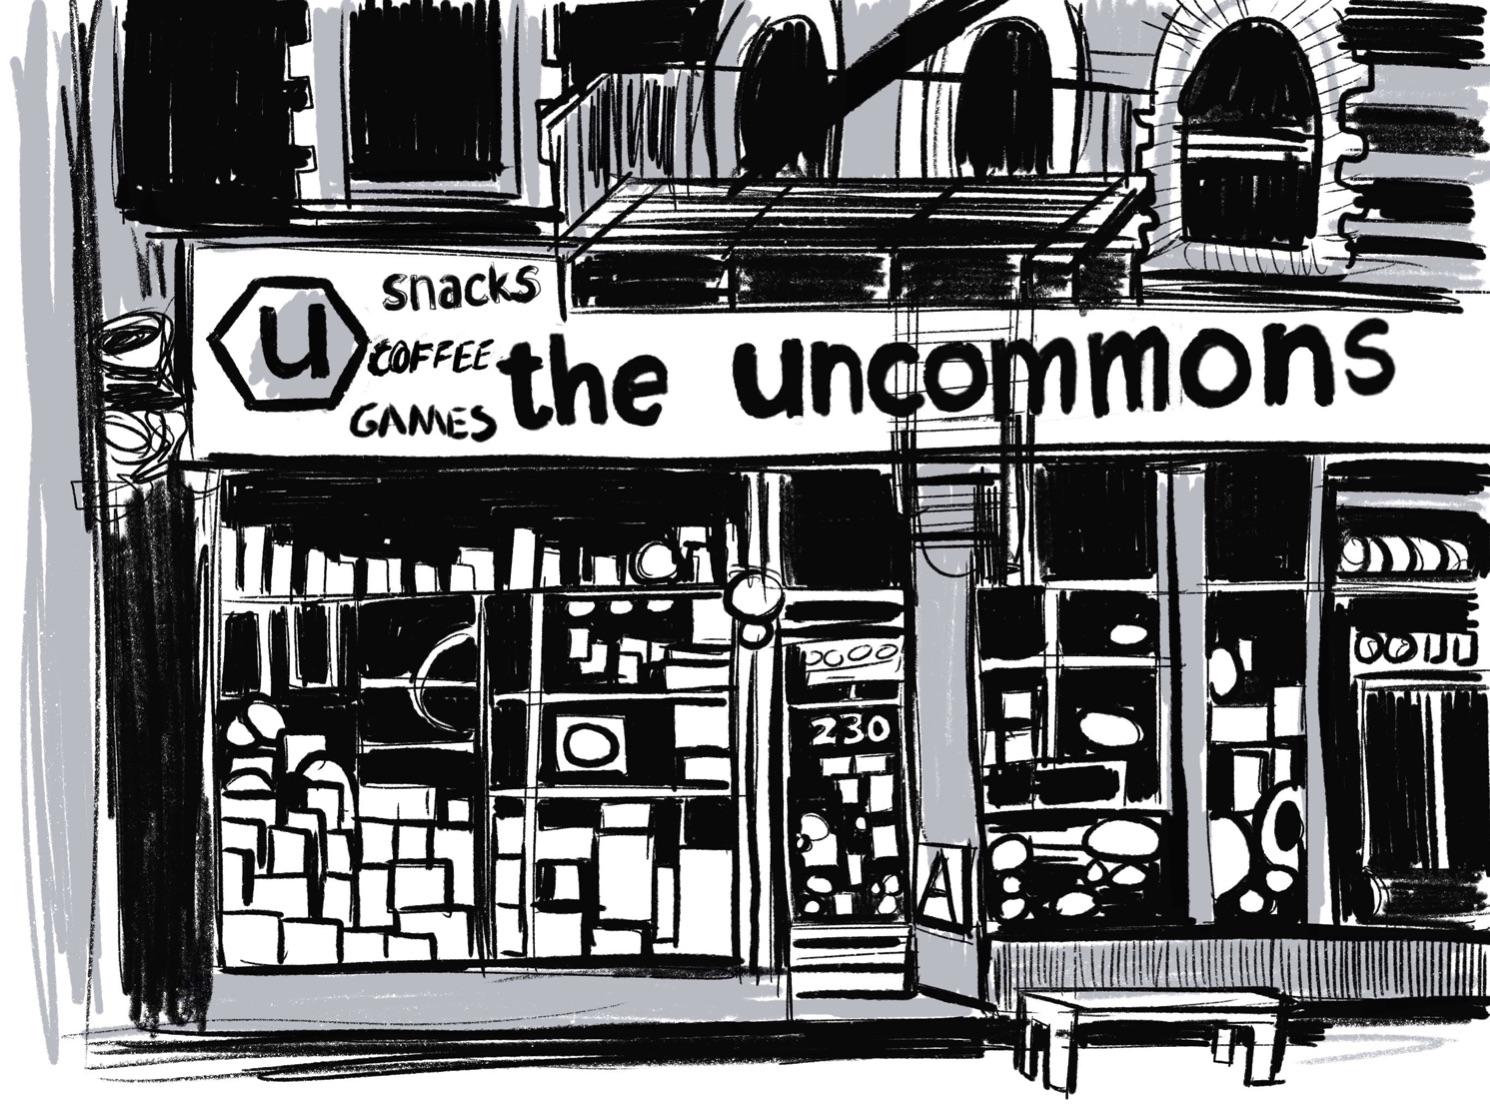 uncommons.jpg